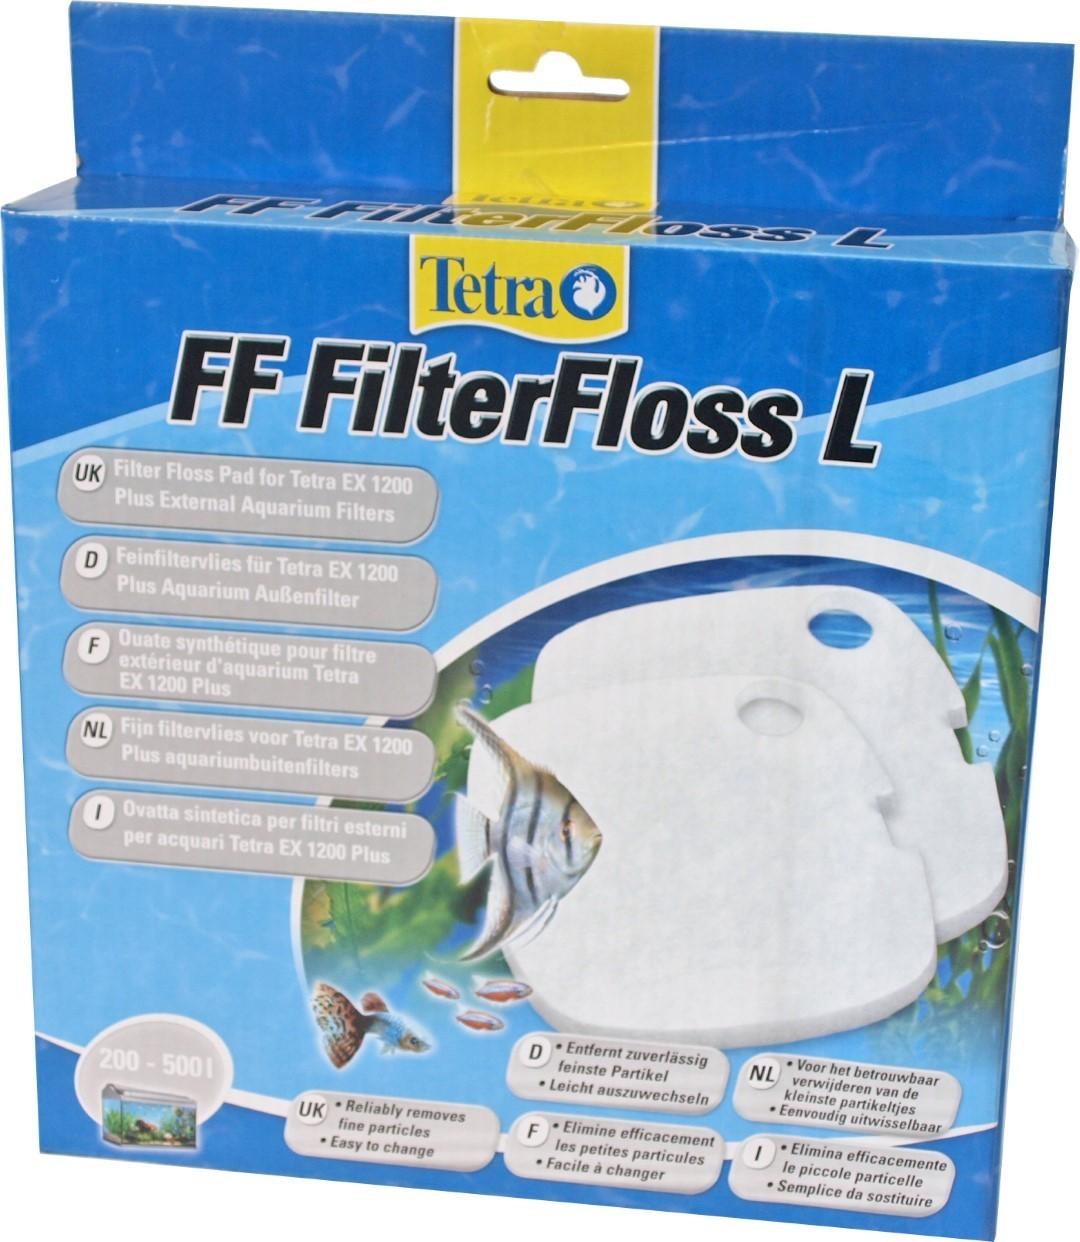 Tetra pak a 2 filterfloss L